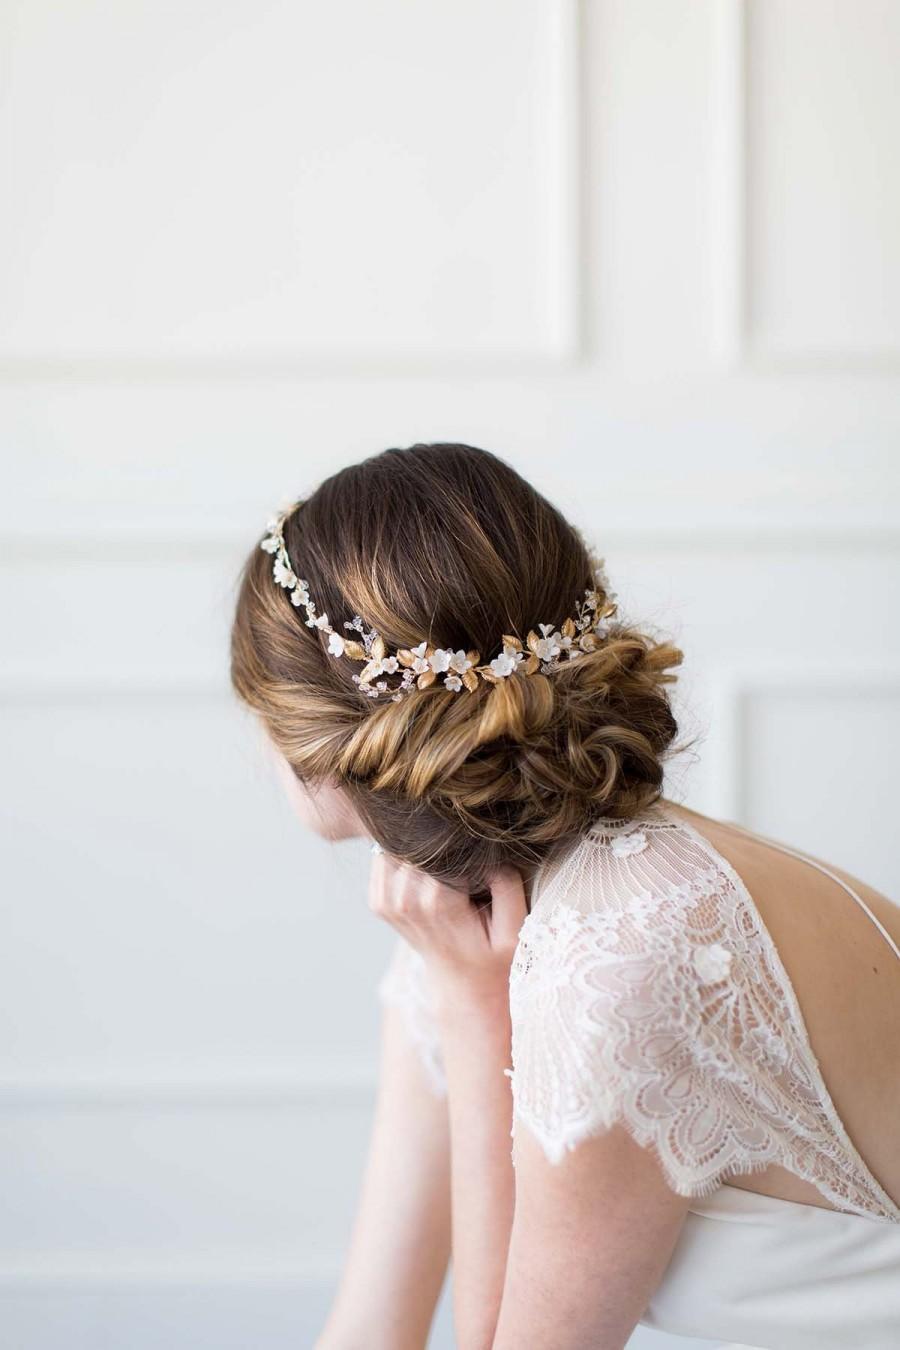 زفاف - Gold Bridal Crown, Bridal Halo, Wedding Hair Accessory, Bridal Circlet, Gold Wedding Hair Piece, Wedding Headpiece - GUIRLANDE de FLEUR